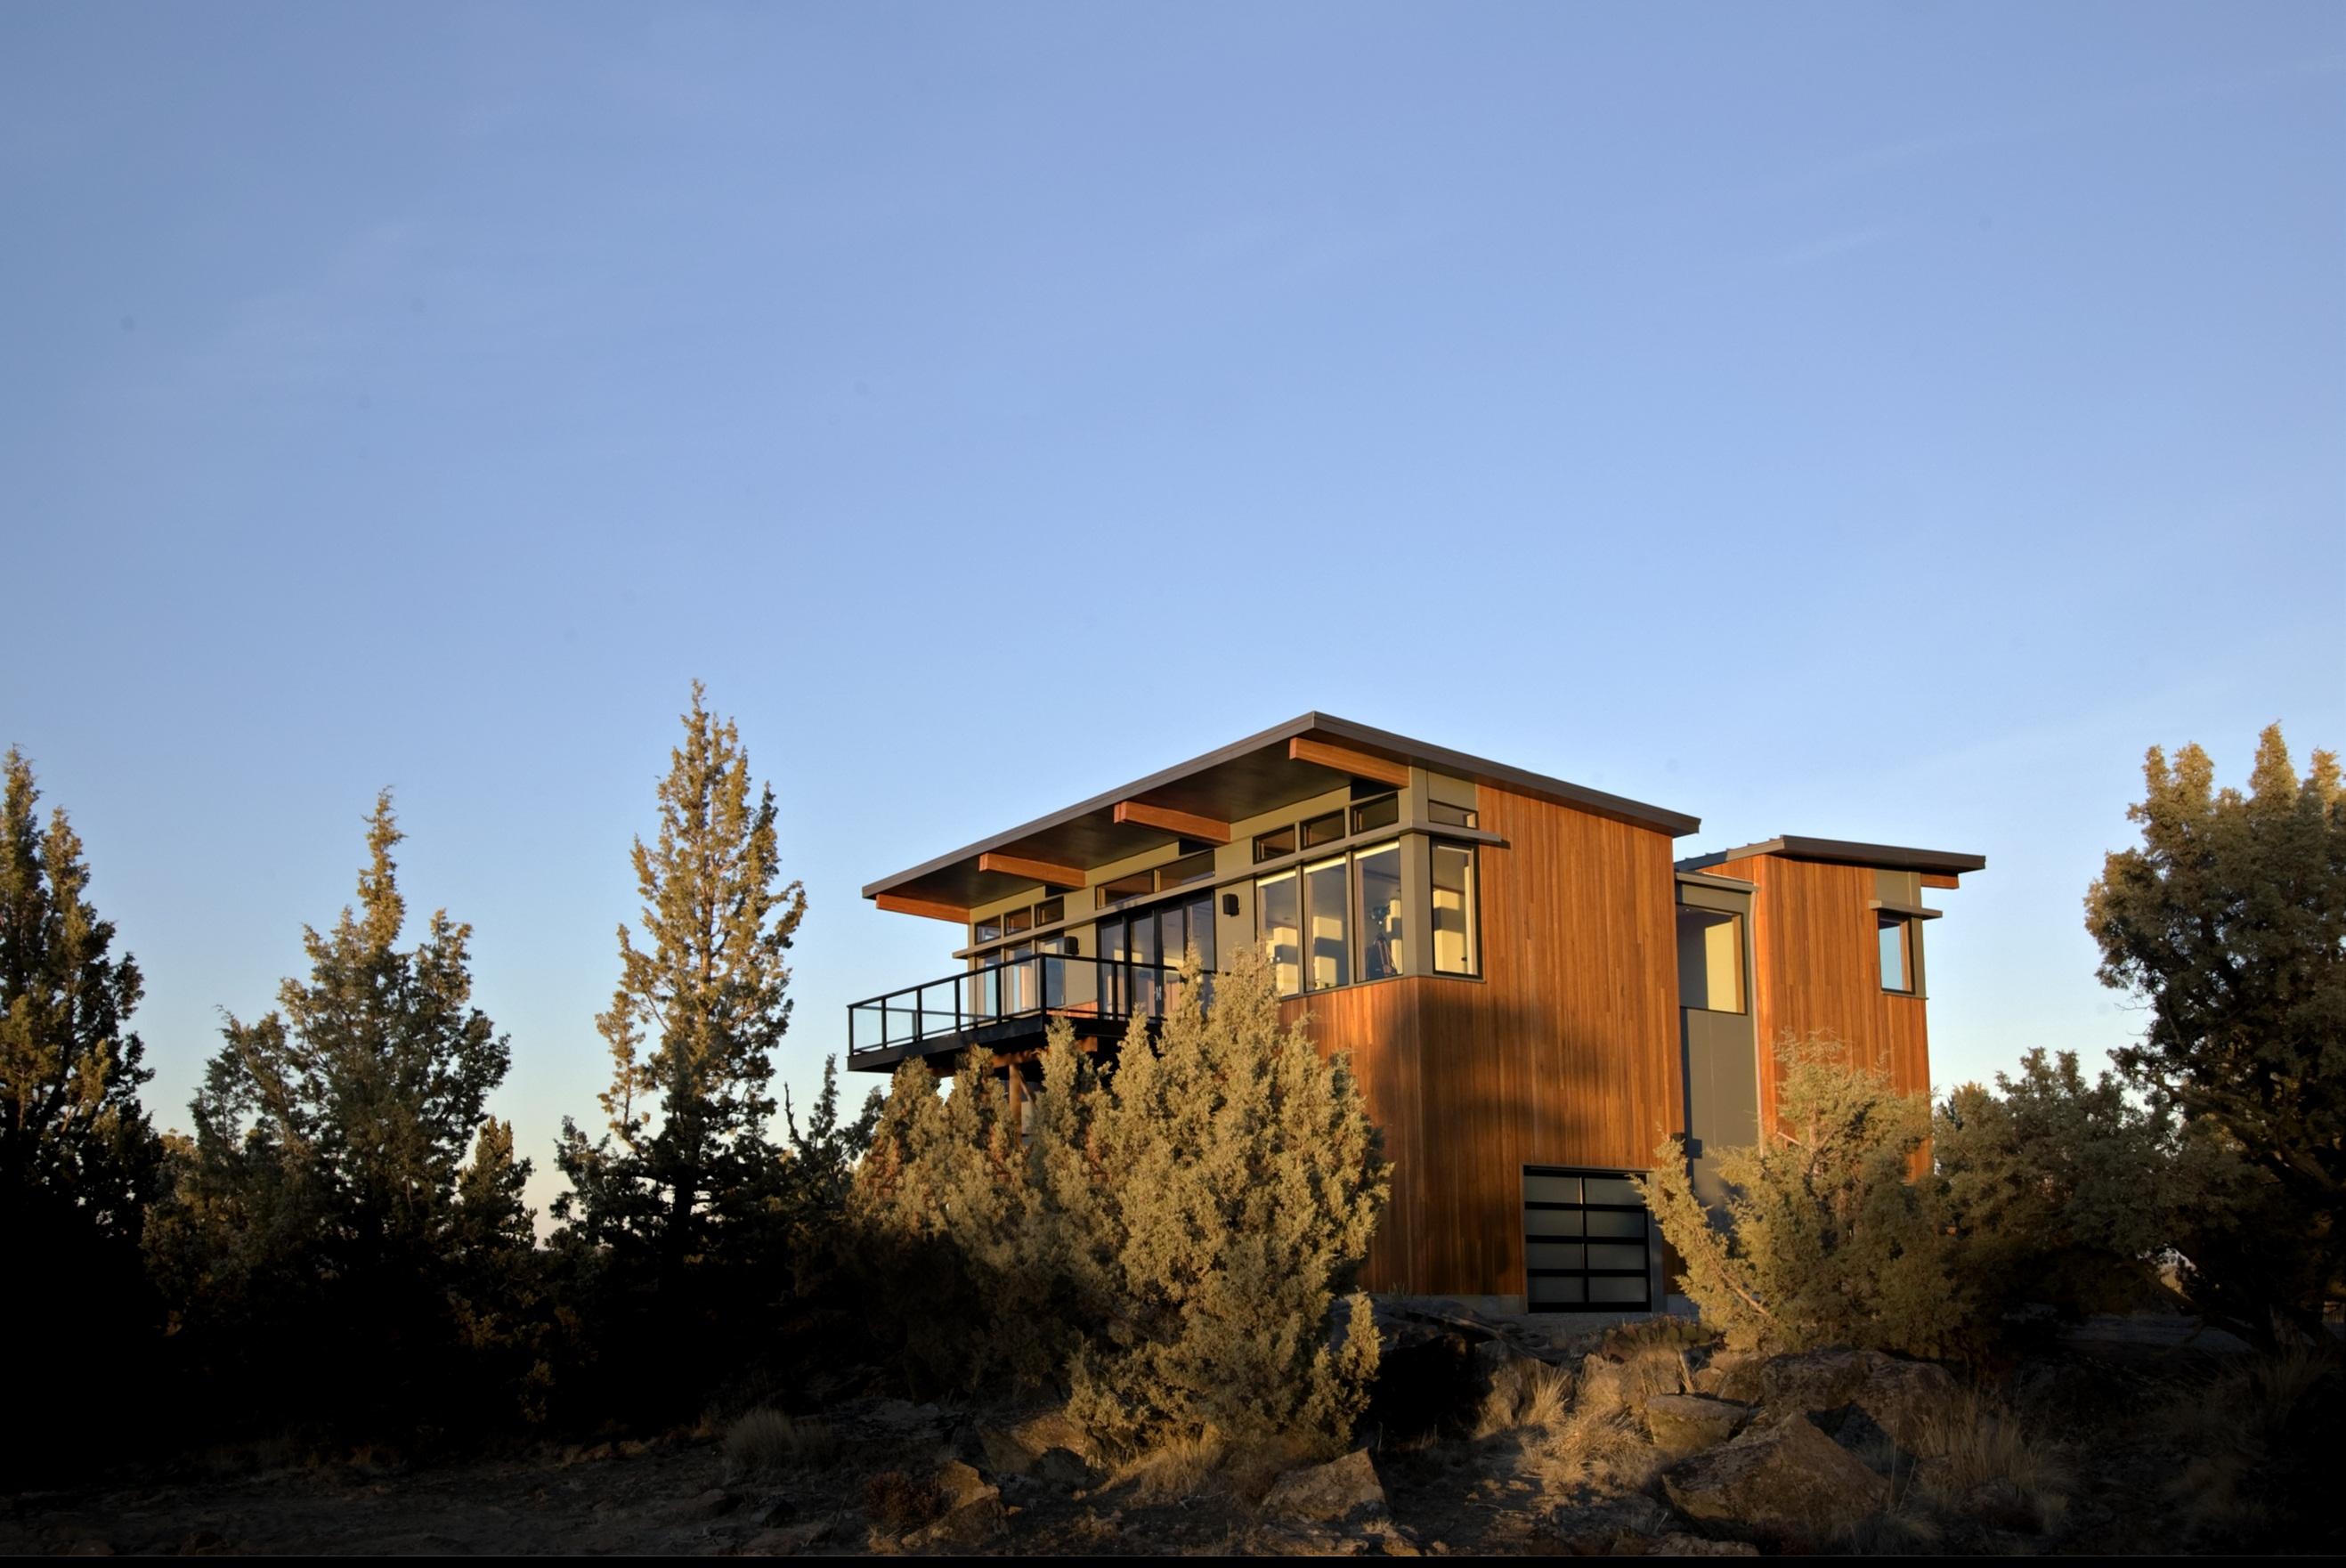 Stillwater Dwellings Prefab Homes Designer Builder Featured Guest Speaker Build